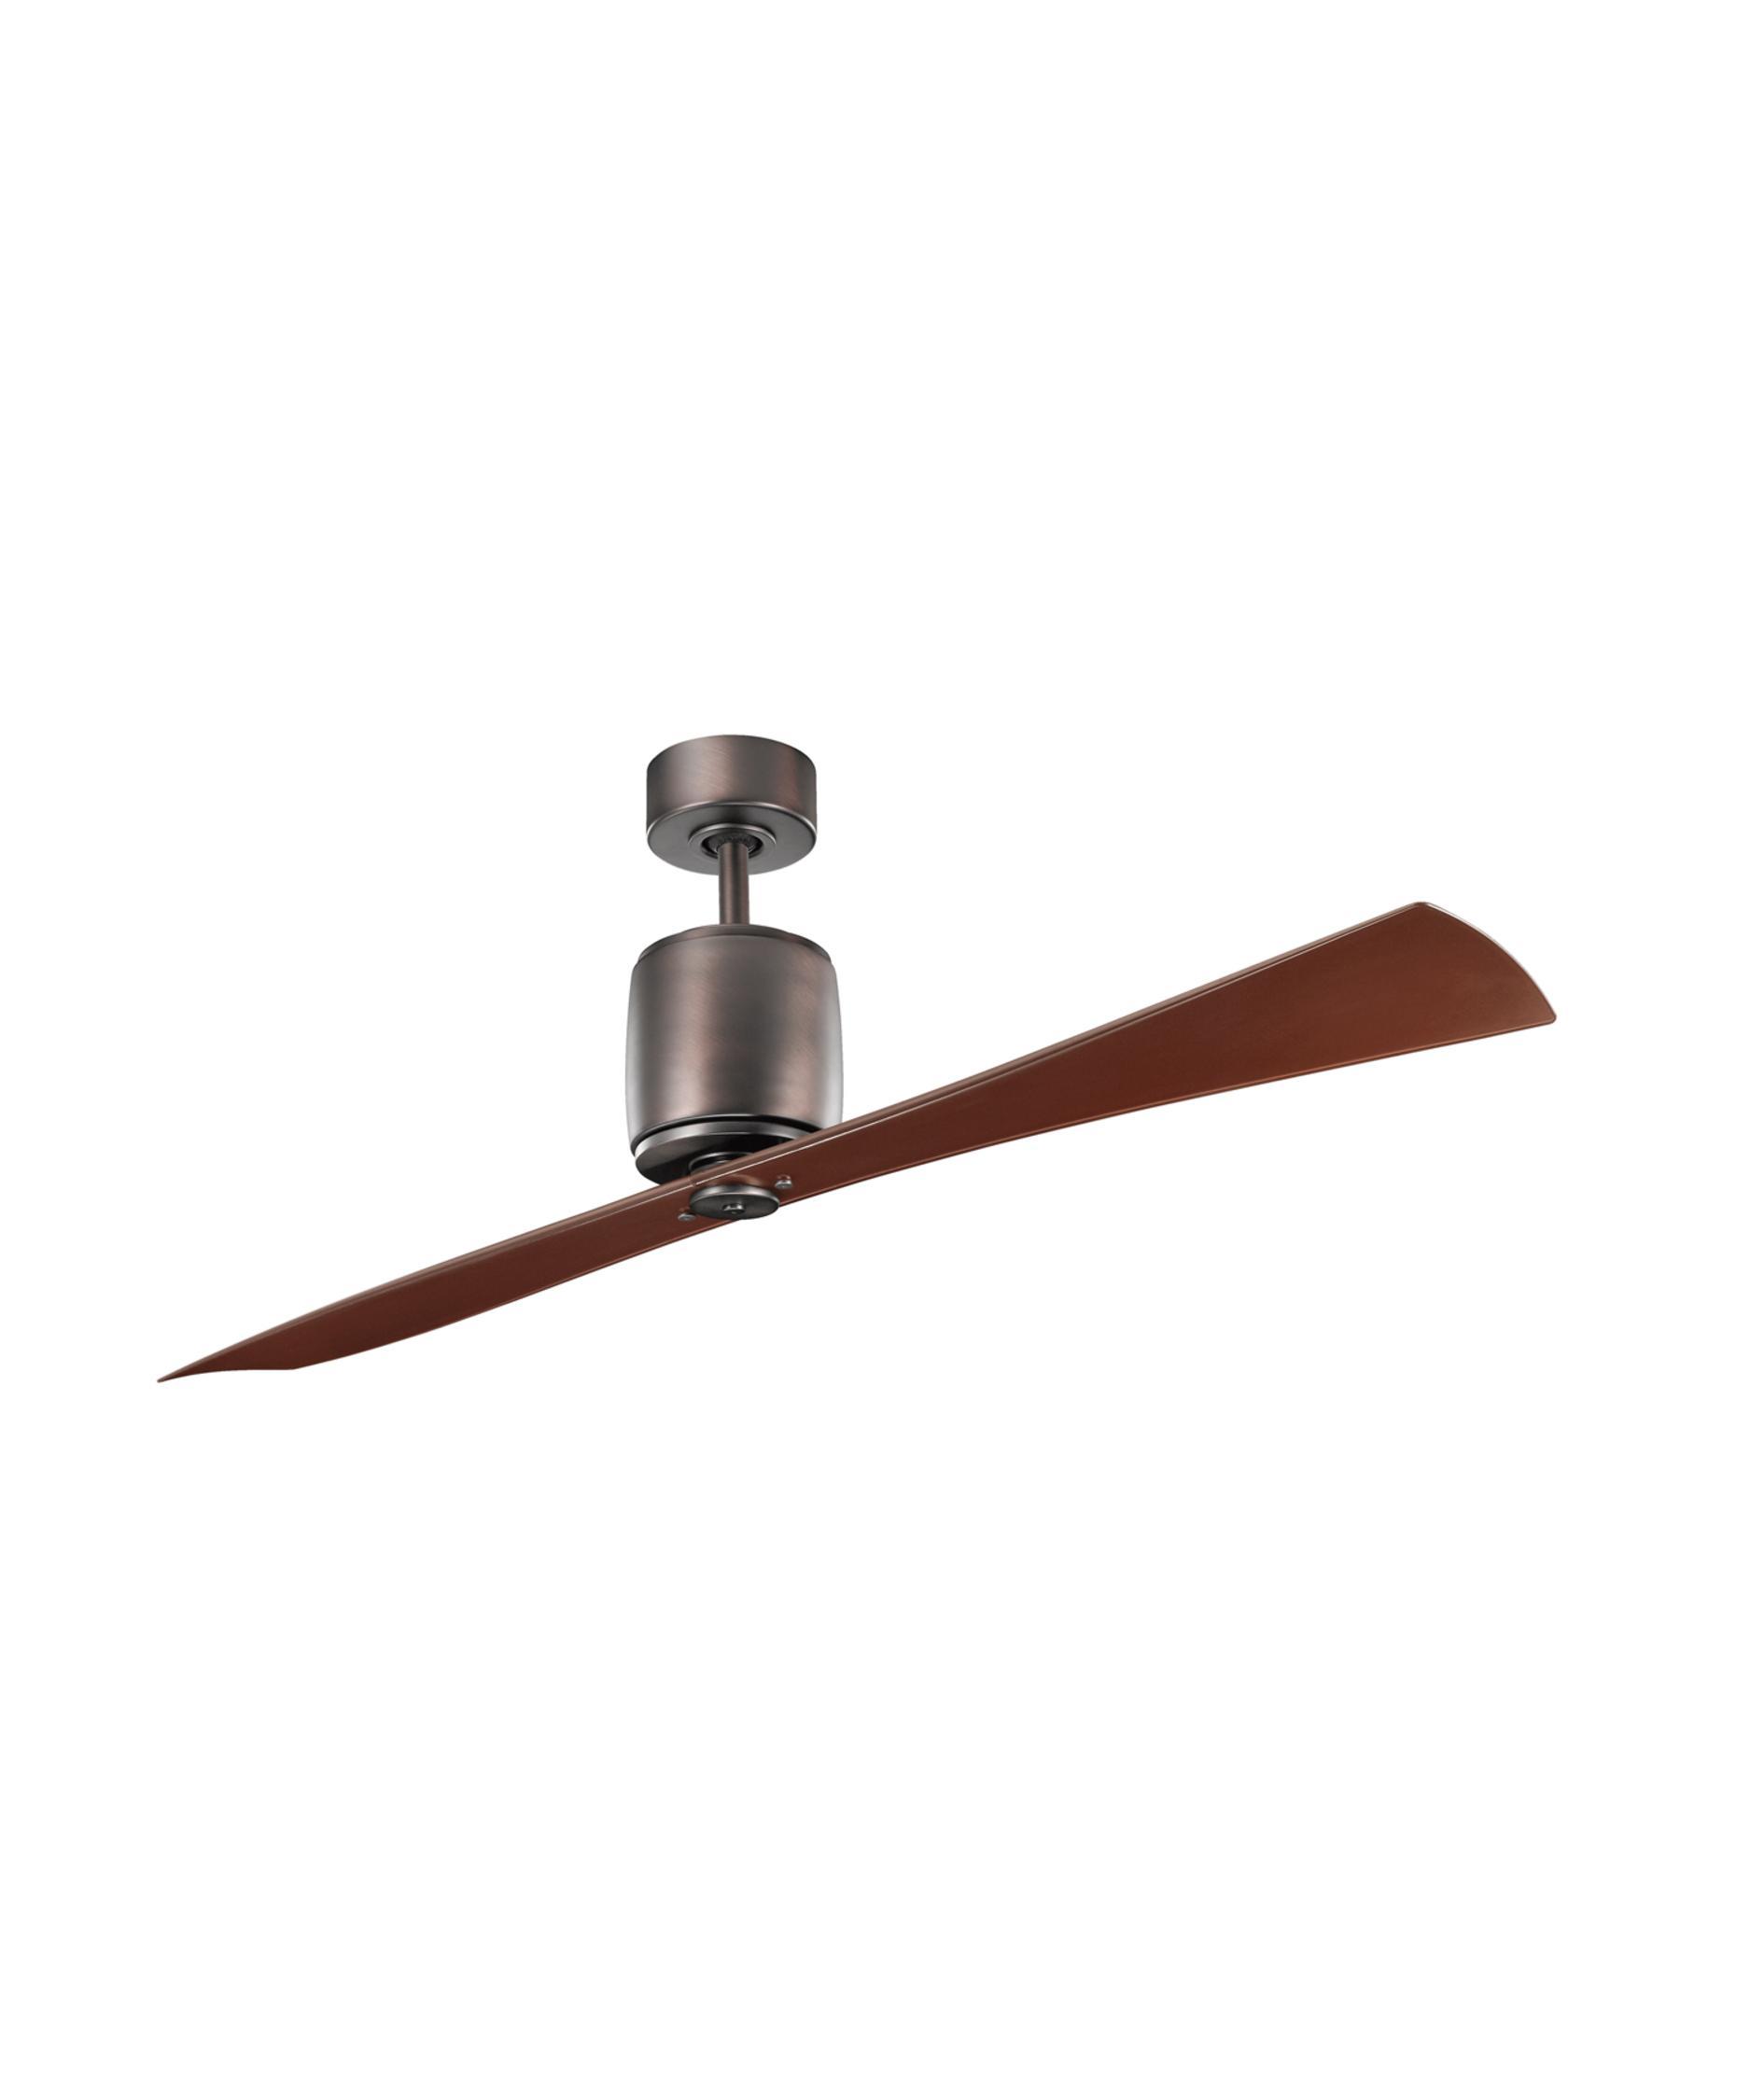 kichler 300160 ferron 60 inch 2 blade ceiling fan | capitol